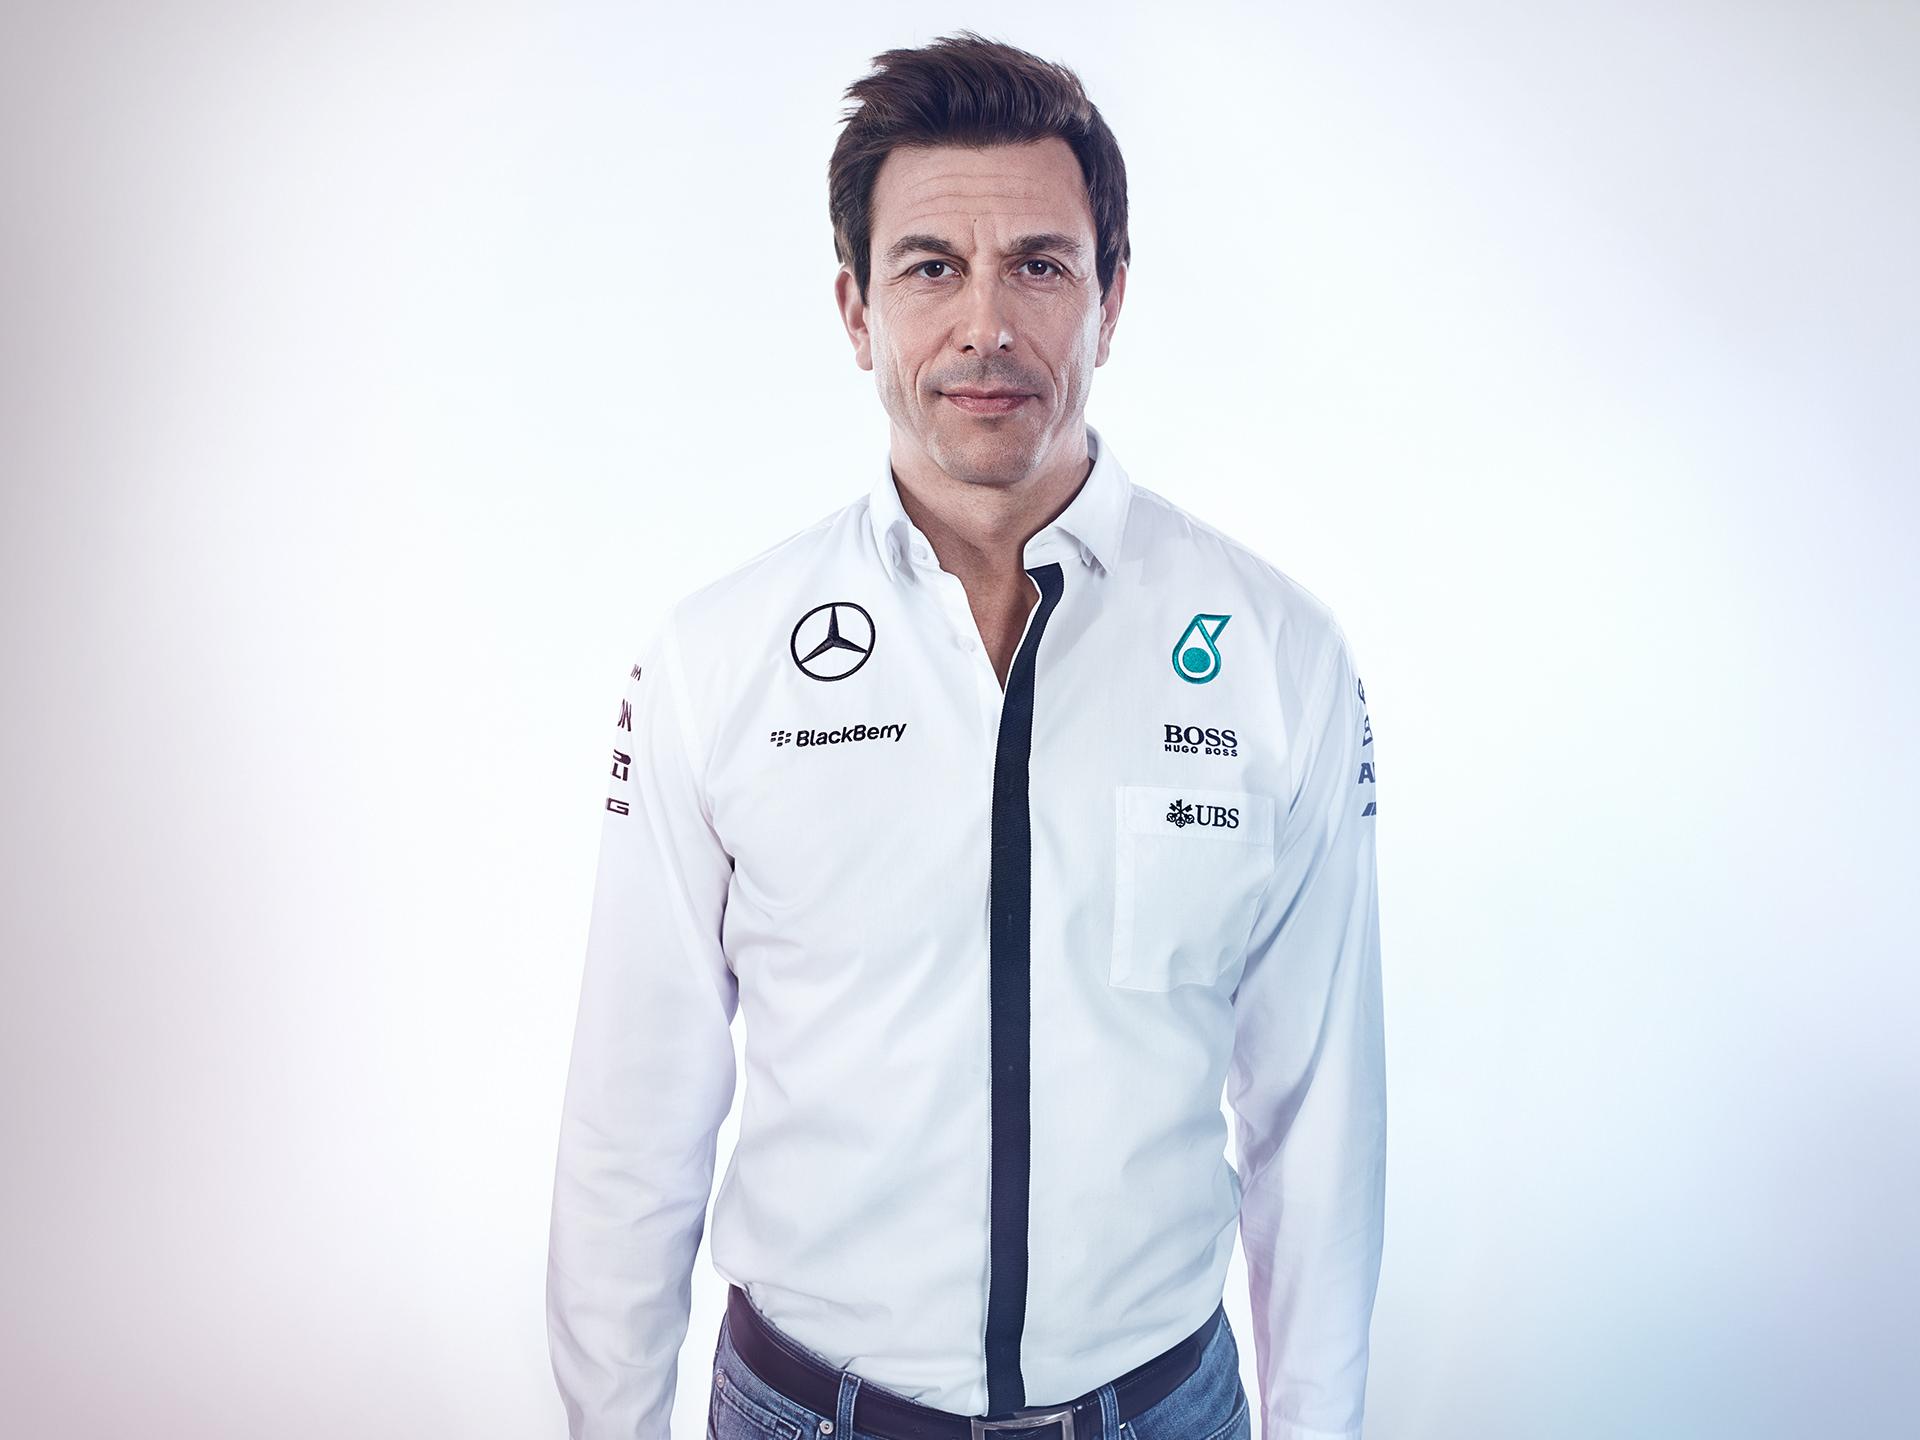 Anke Luckmann, www.ankeluckmann.com, trey, Mercedes Benz, Formel 1, F1, Barcelona, circuit de catalunya, spain, amg, toto wolff